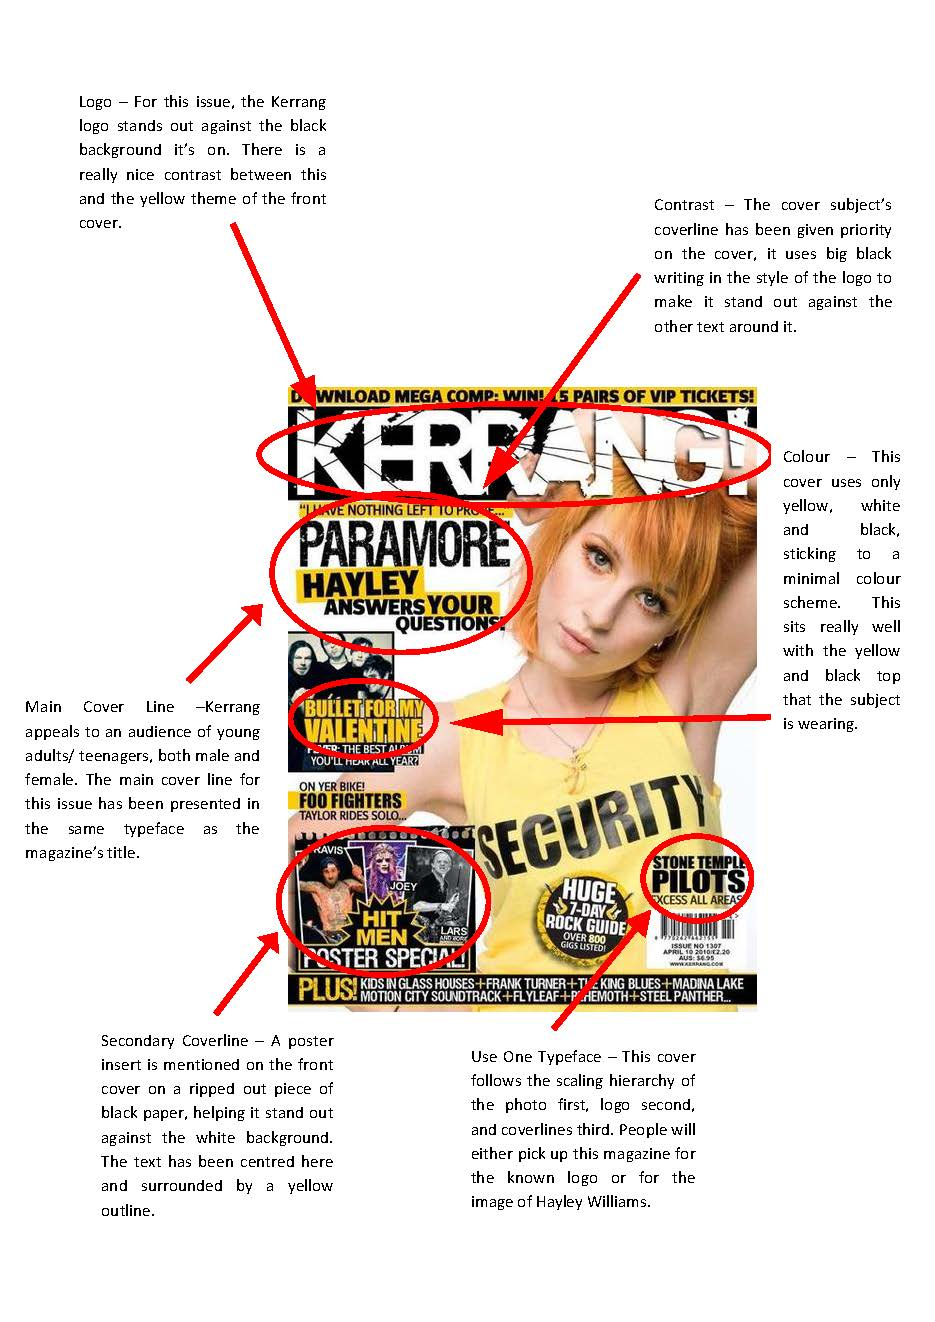 AS Media Blog: Anatomy of a Magazine Cover